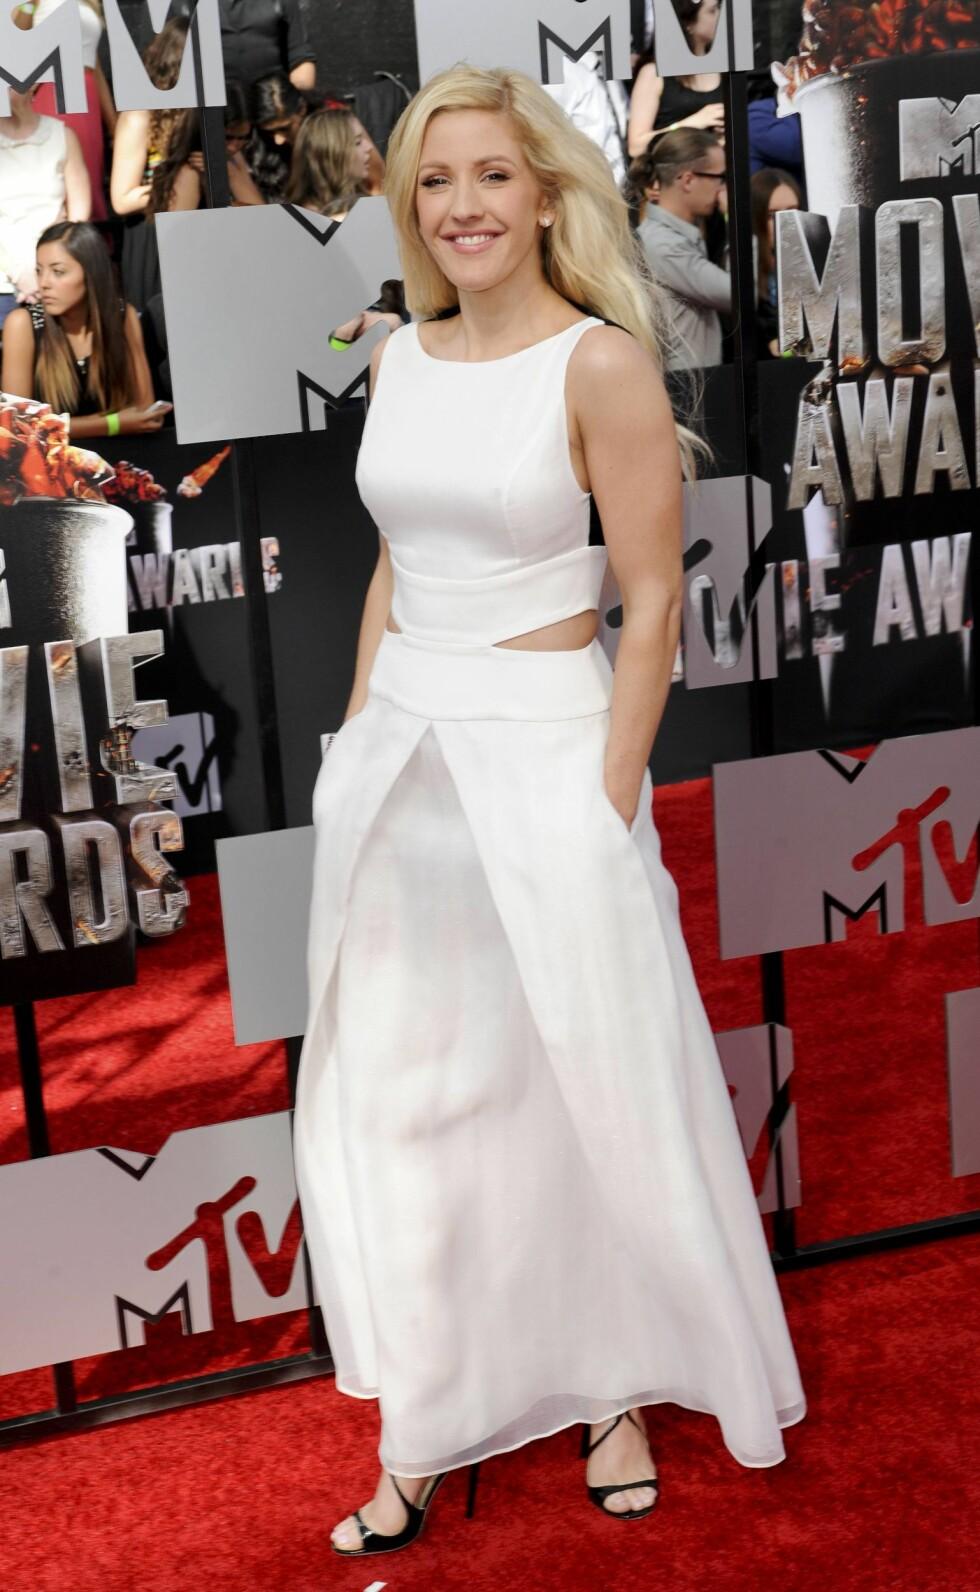 MTV: Ellie Goulding  Foto: imago/PicturePerfect/ All Over Press